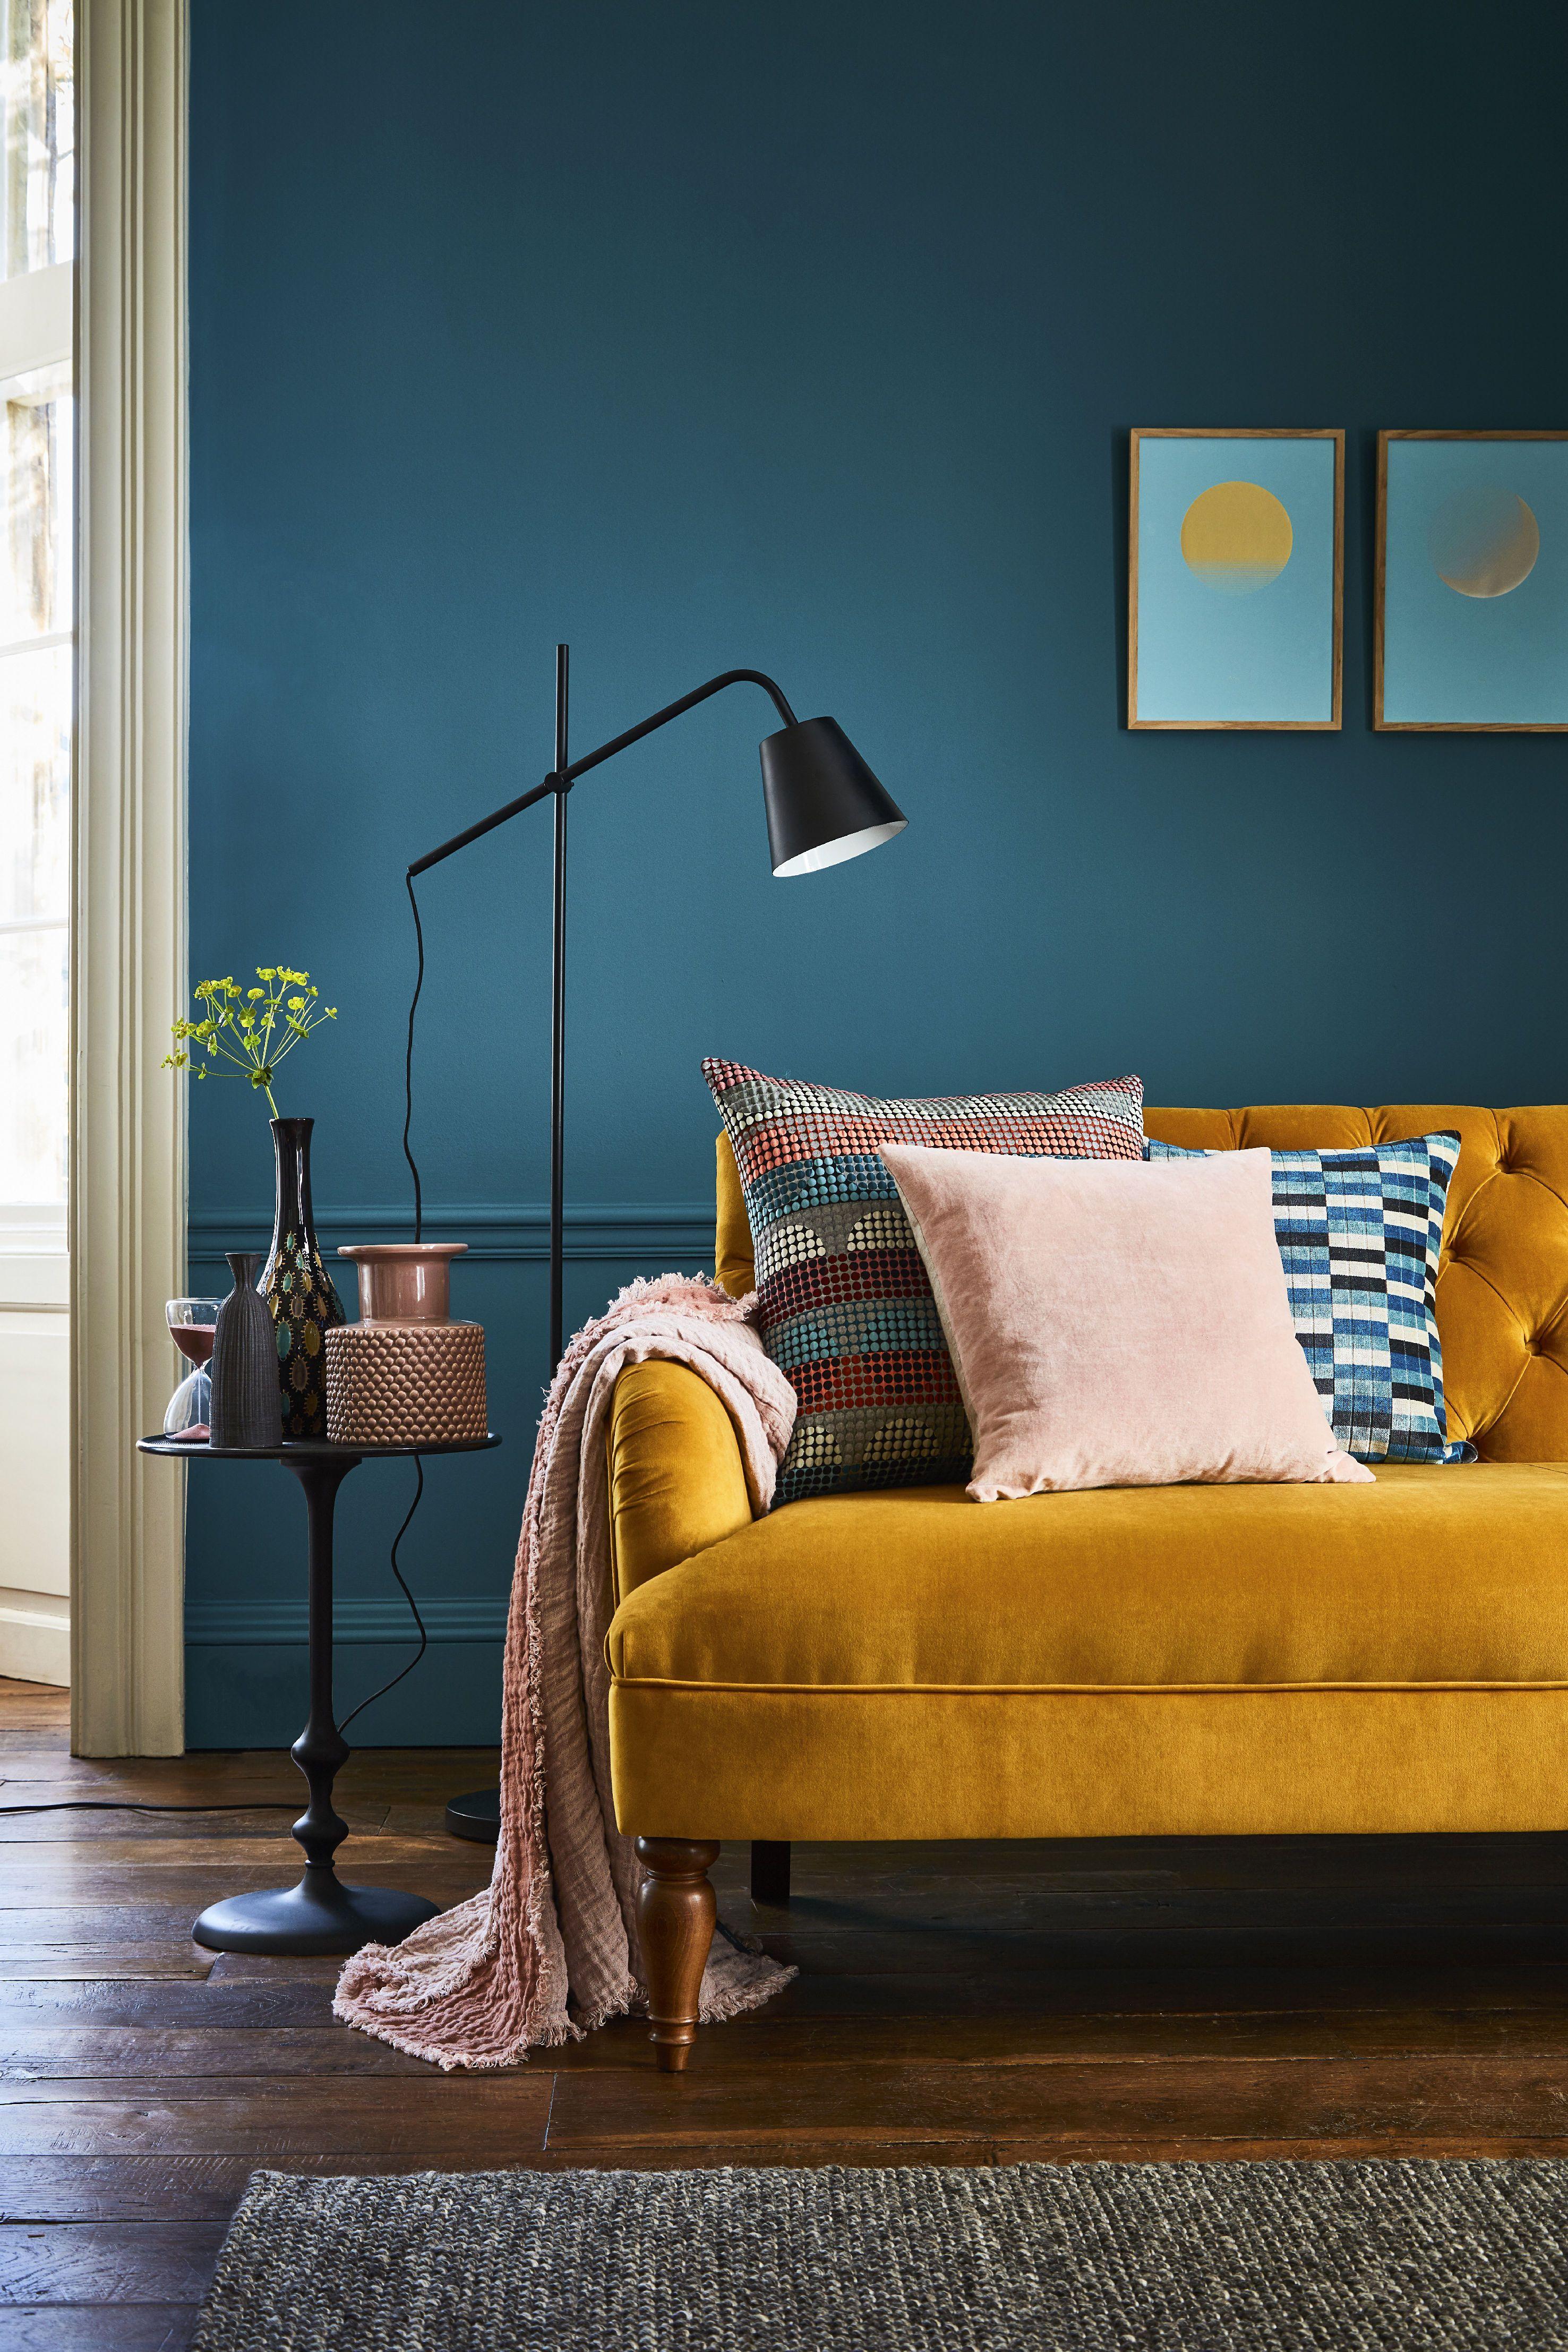 14 Small Living Room Design Ideas In 2020 Living Room Design Colour Teal Living Rooms Mustard Living Rooms #teal #and #mustard #living #room